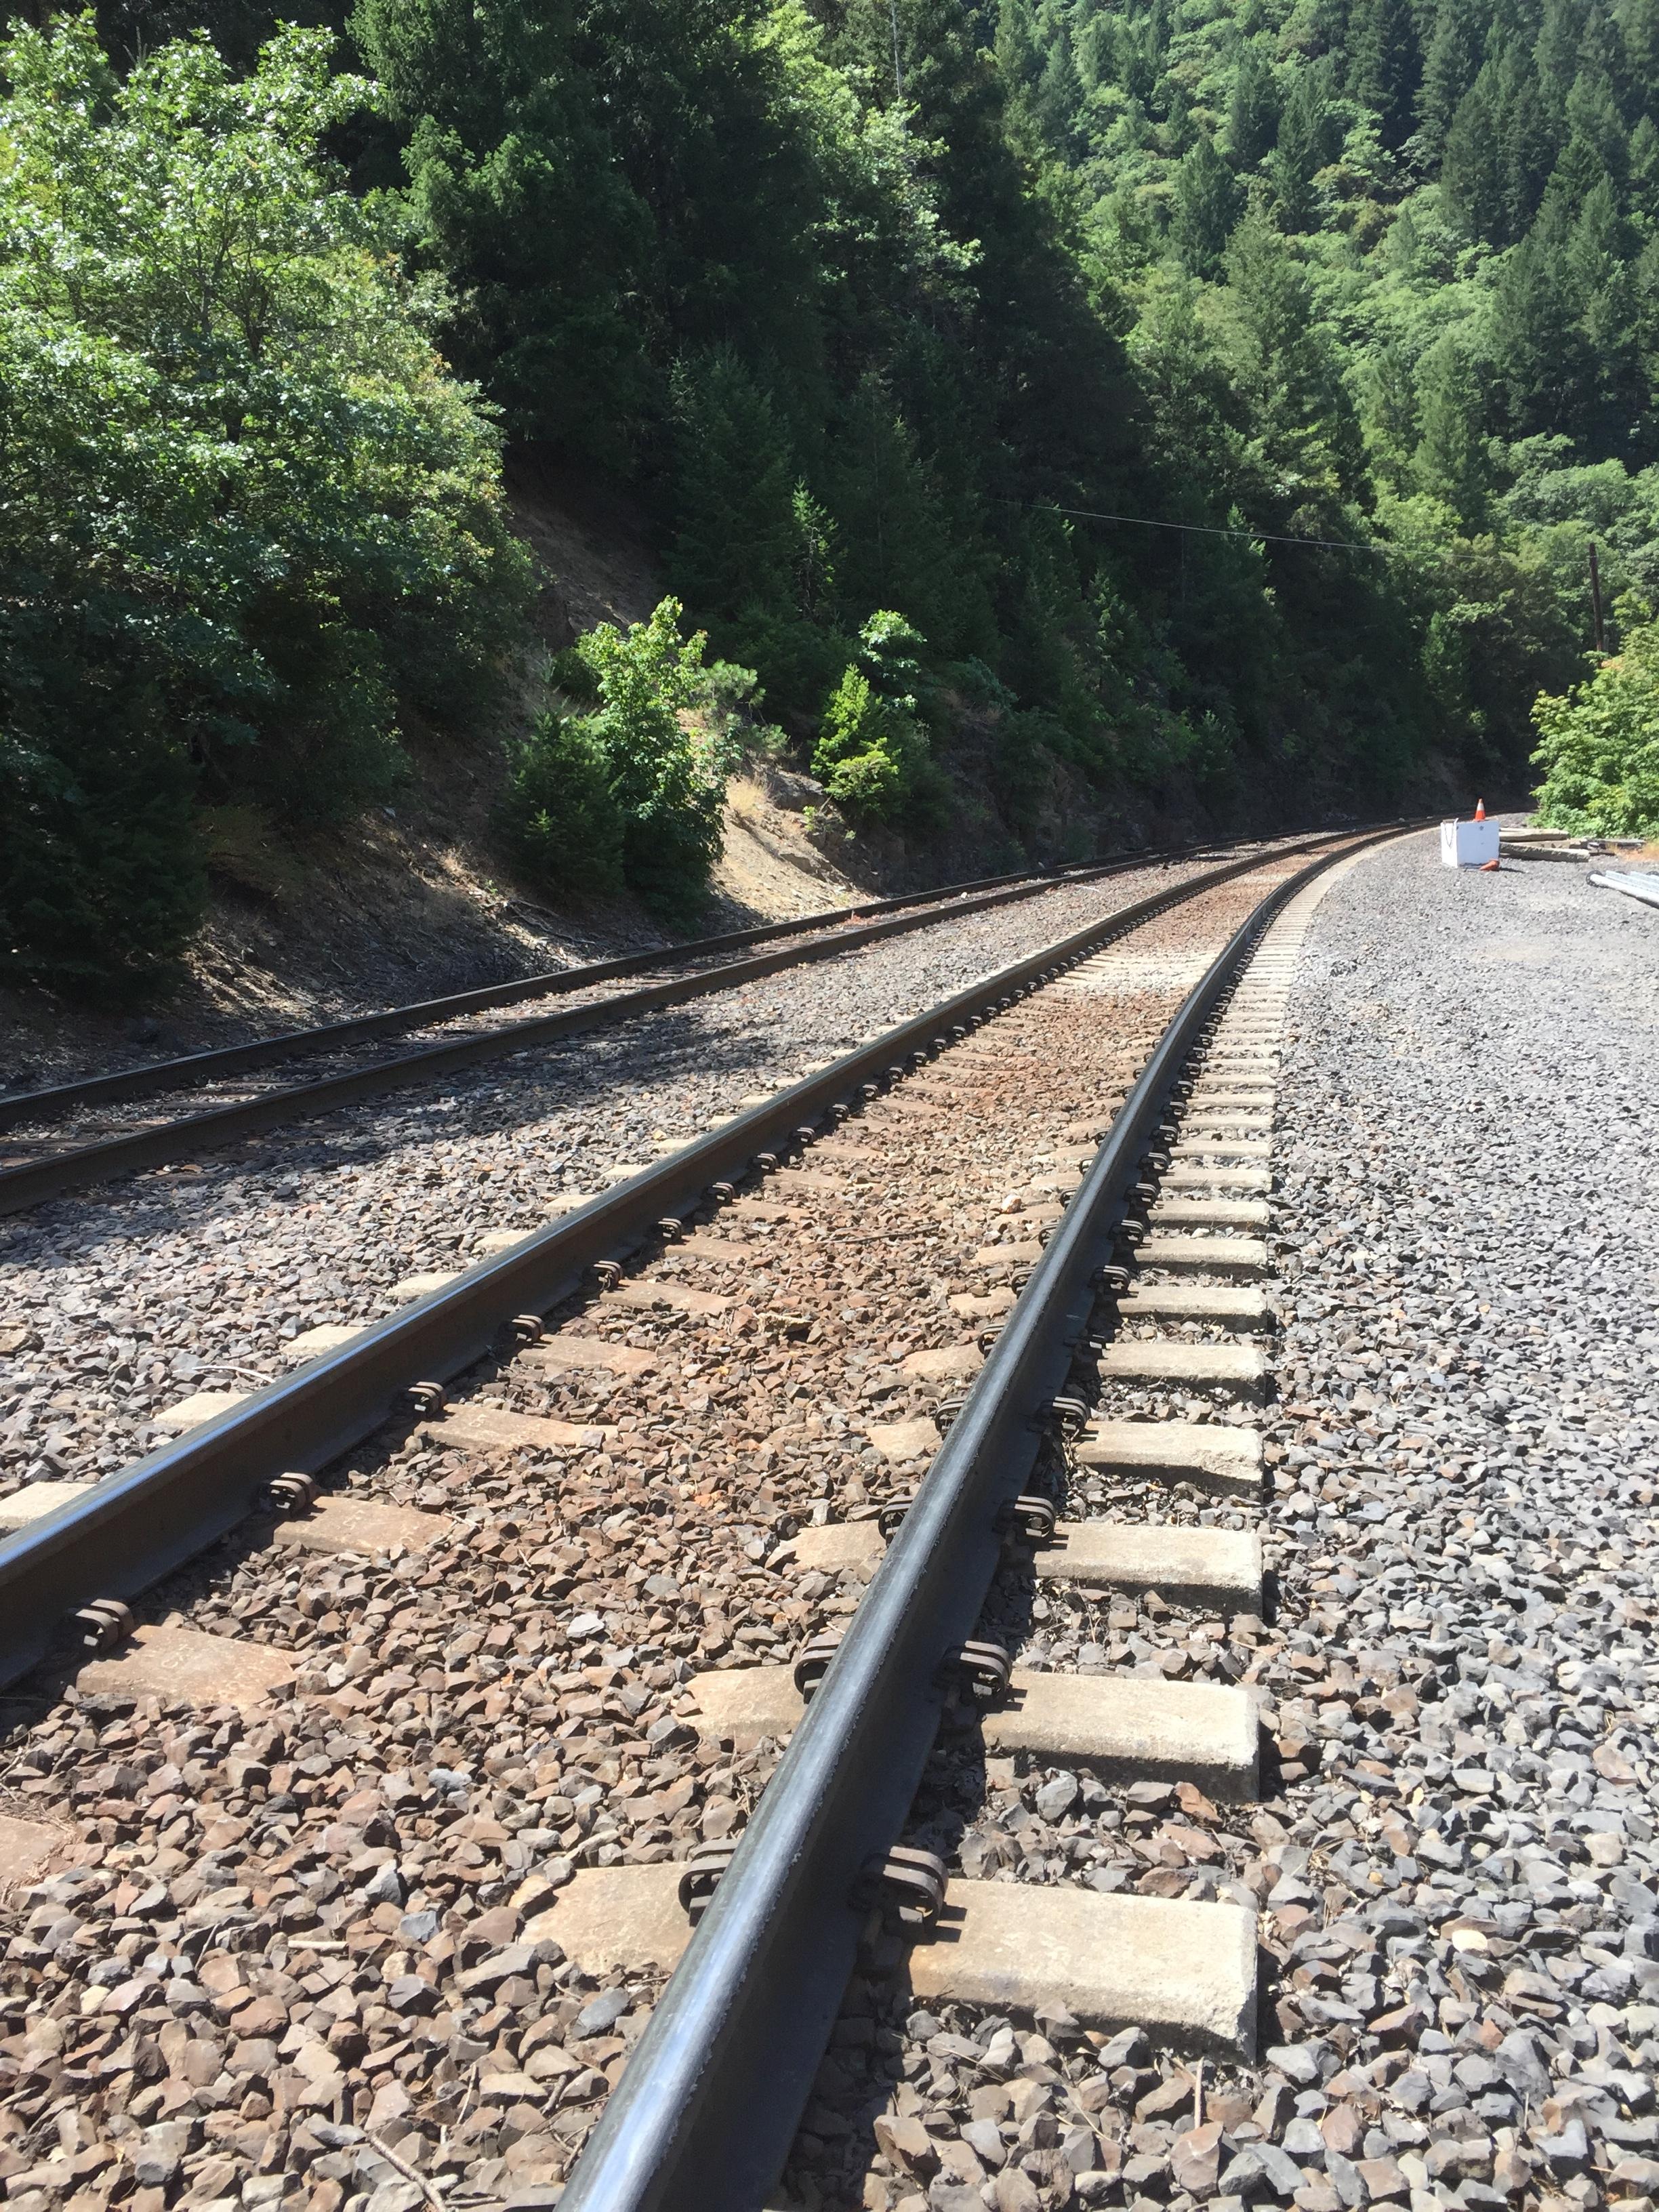 Train track crossing to get to Belden